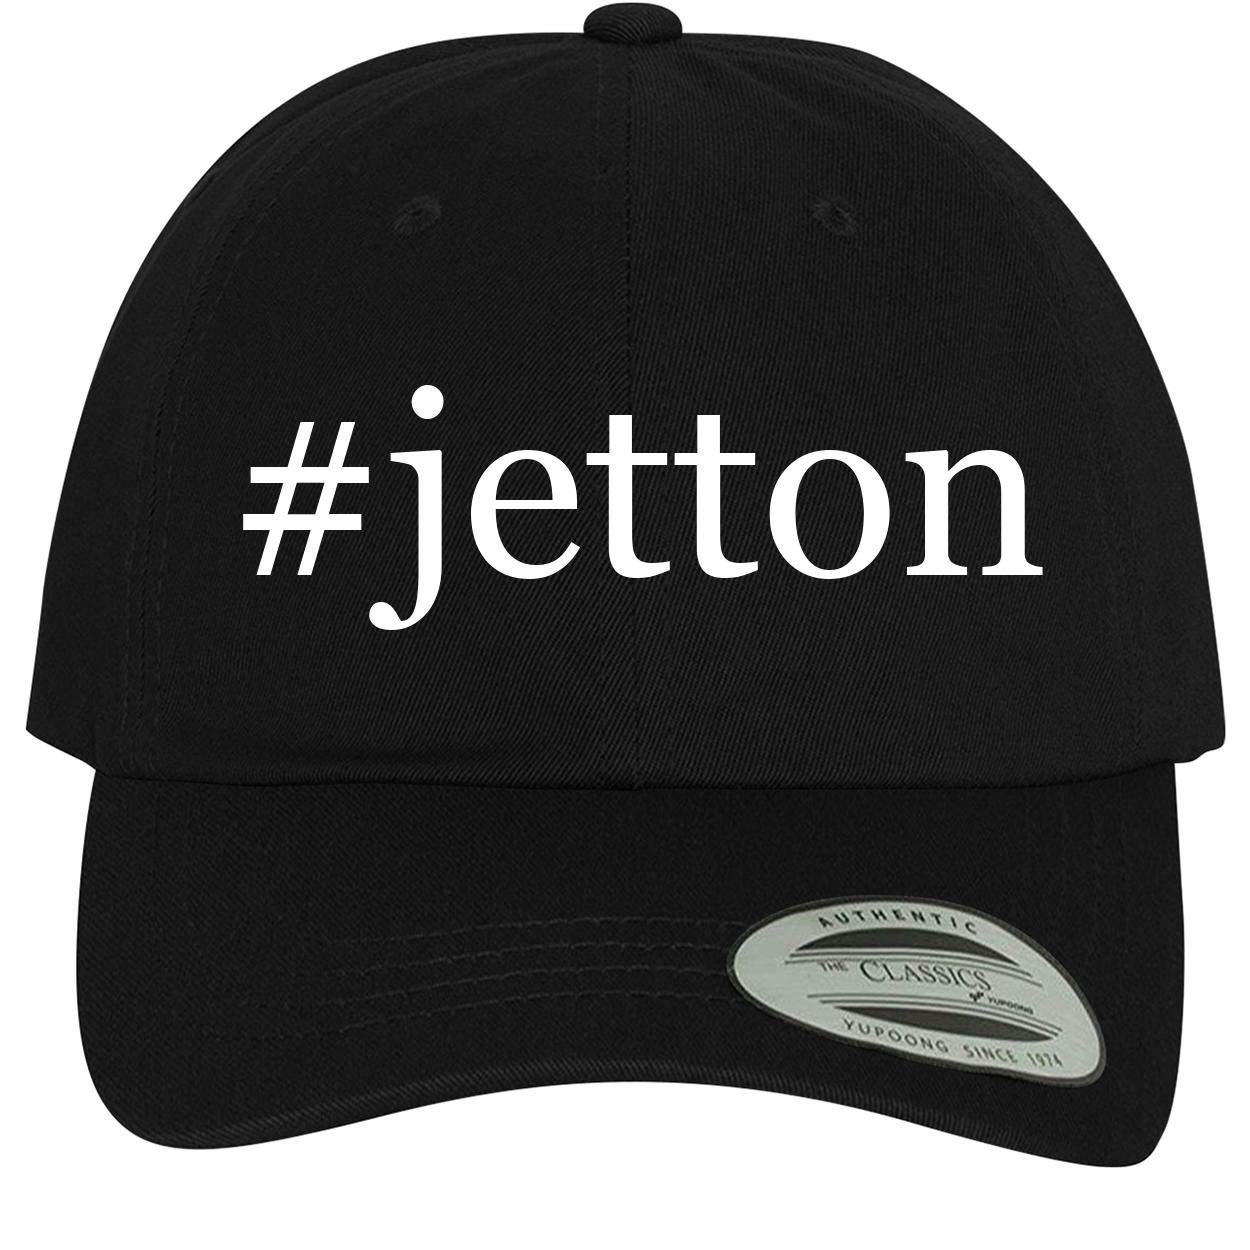 Comfortable Dad Hat Baseball Cap BH Cool Designs #Jetton